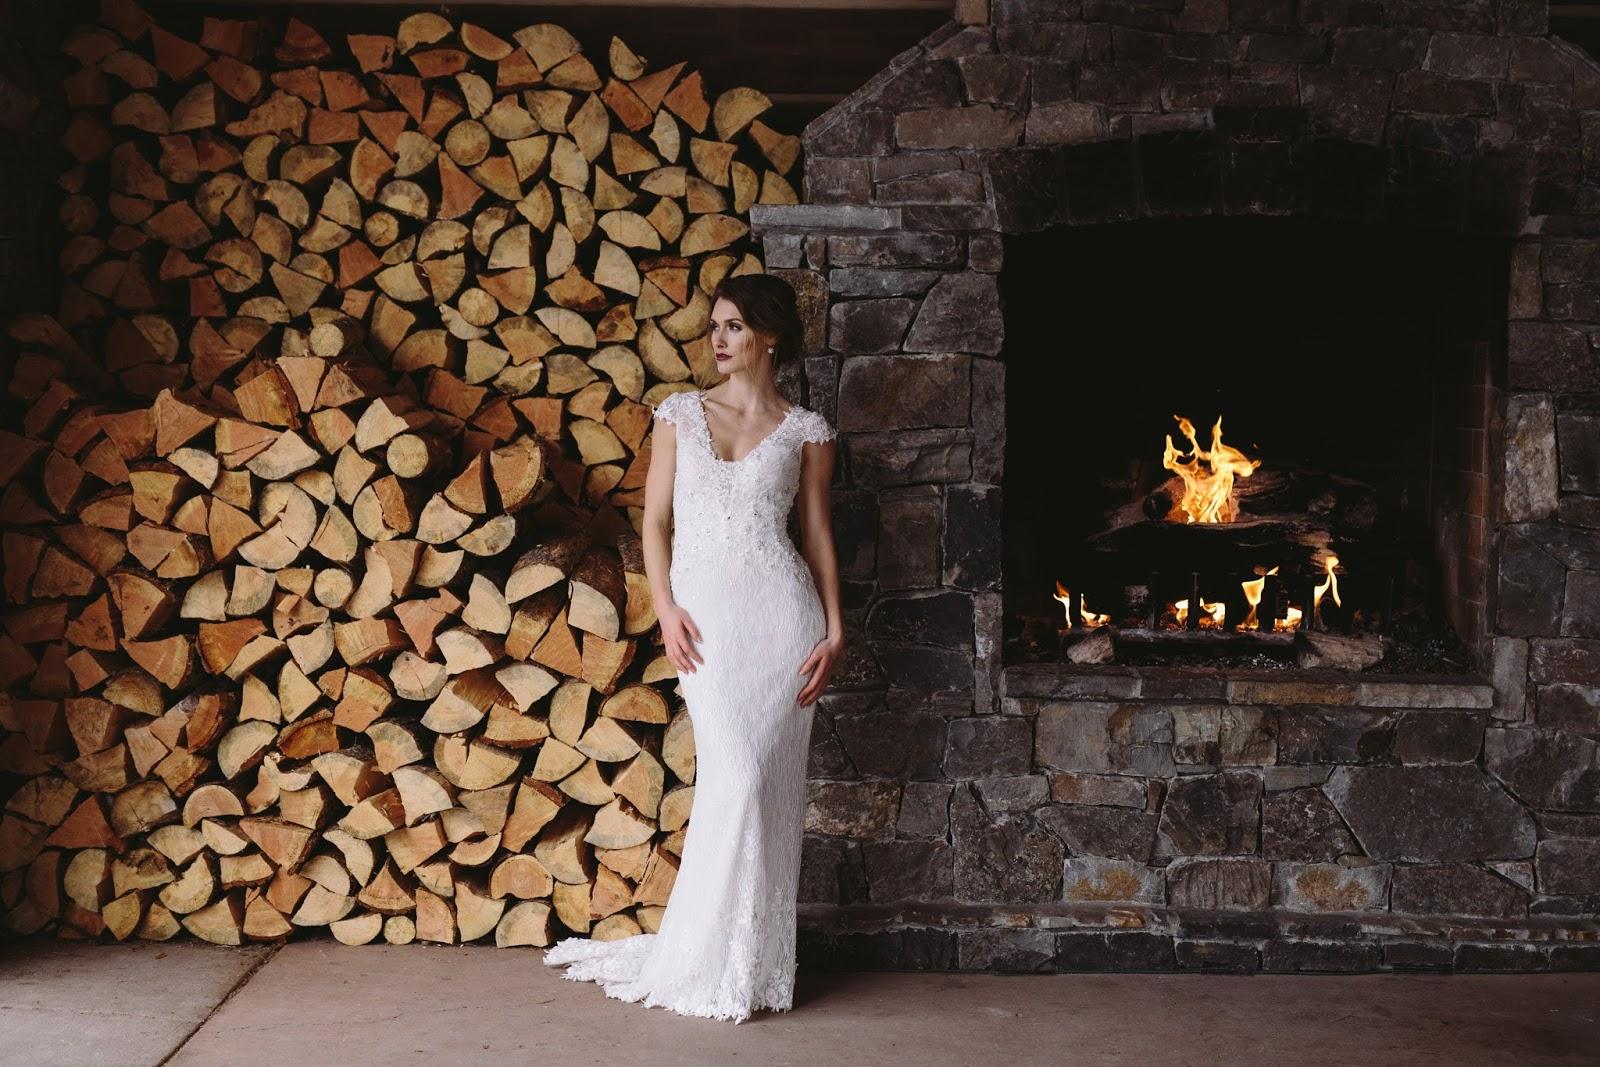 Montana Winter Wedding Venue / The Lodge at Whitefish Lake